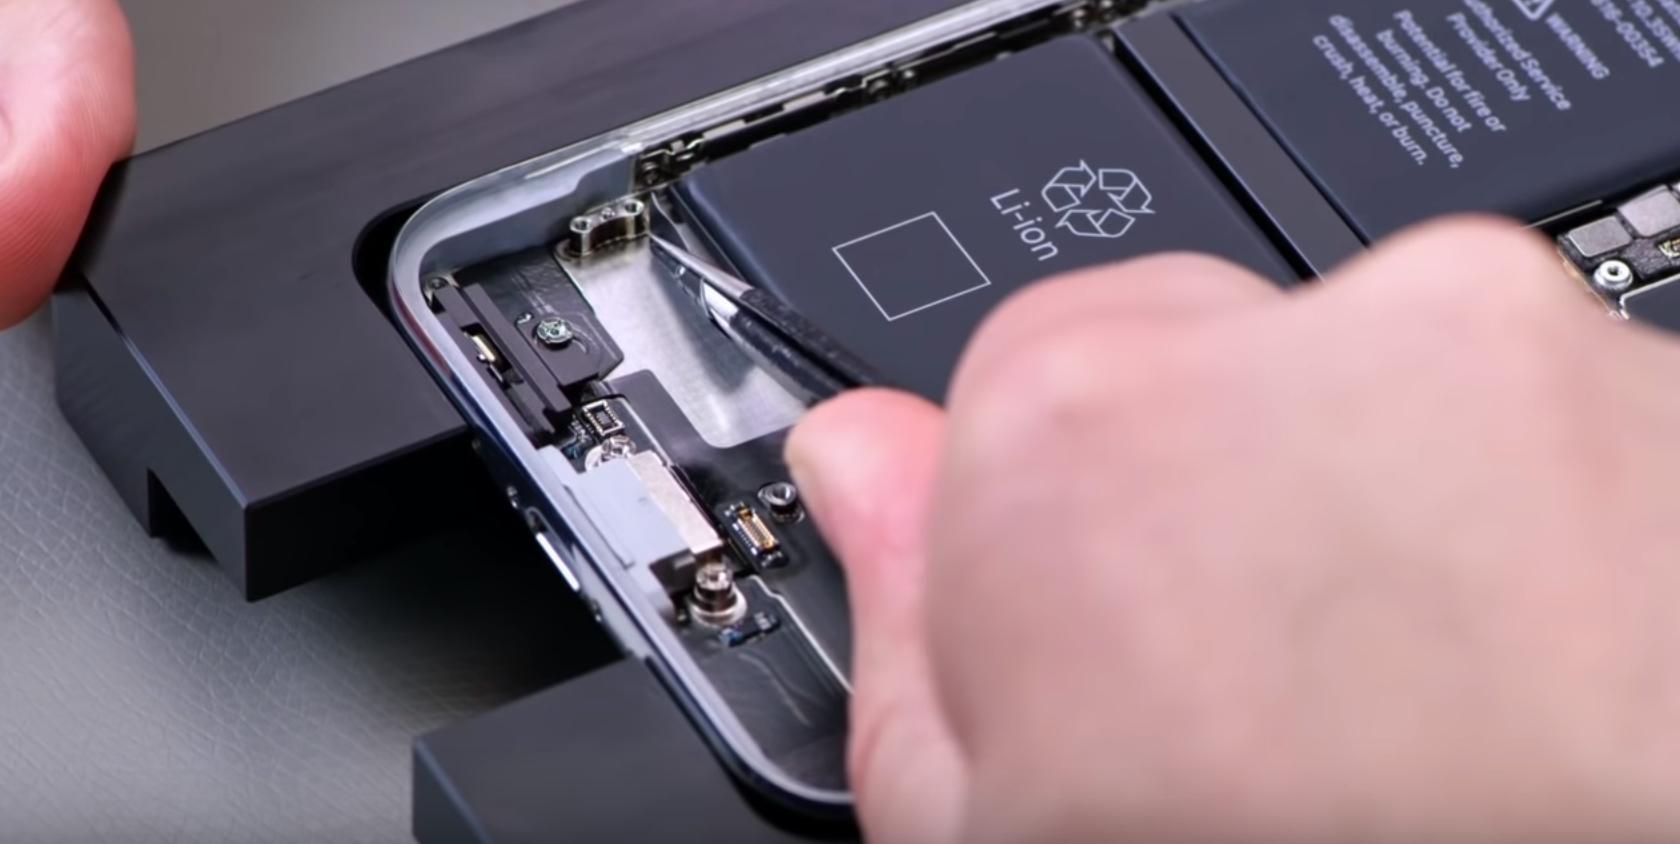 Apples hemmelige og interne videoer avsløres hvordan du fikser dine Apple-produkter